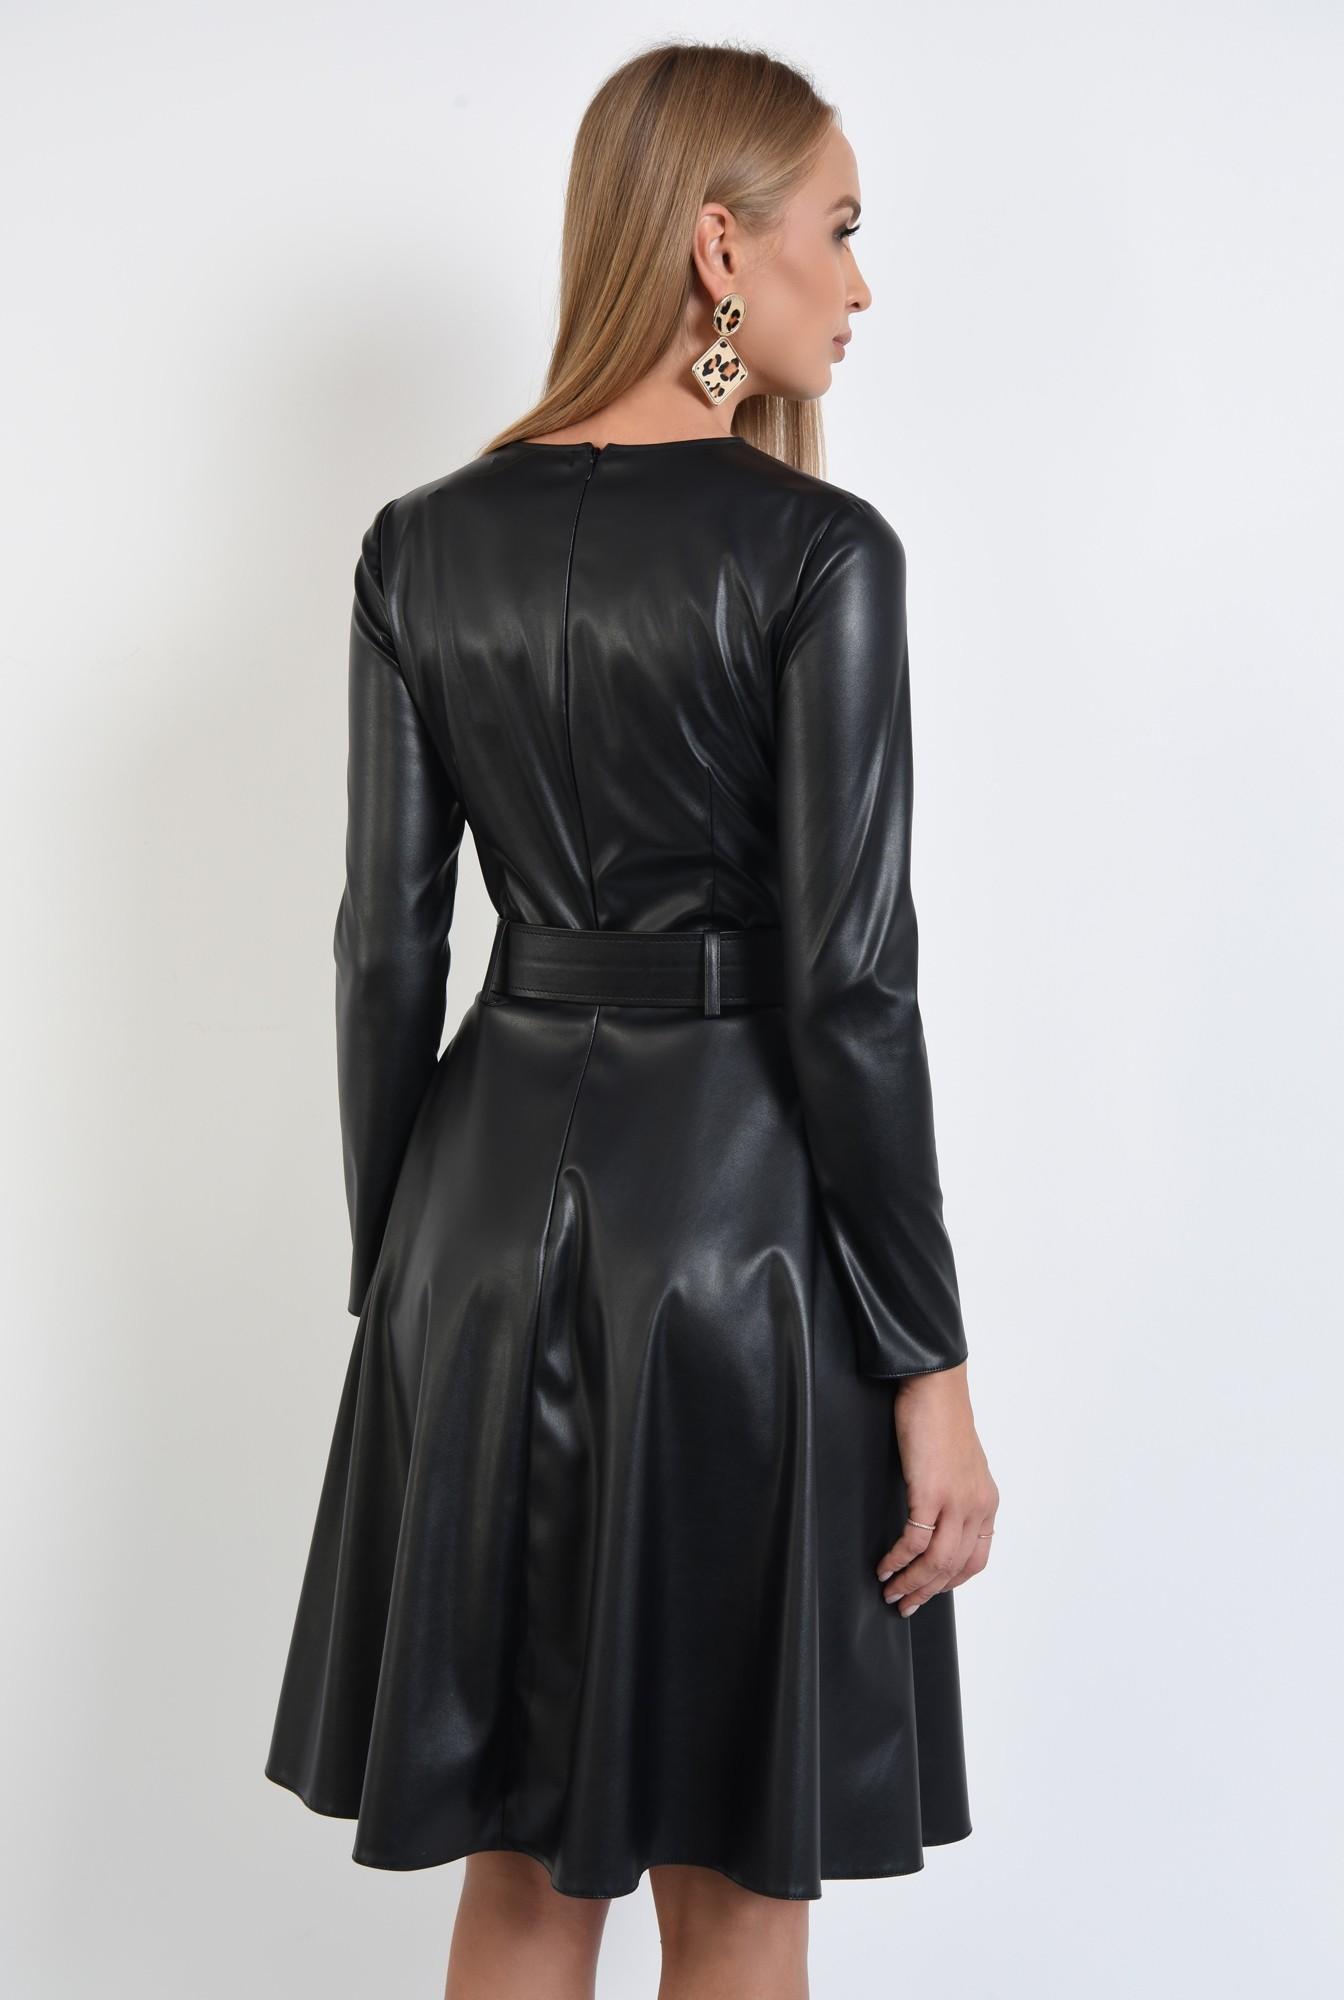 1 - rochie casual neagra, cusatura mediana, fermoar la spate, rochii online